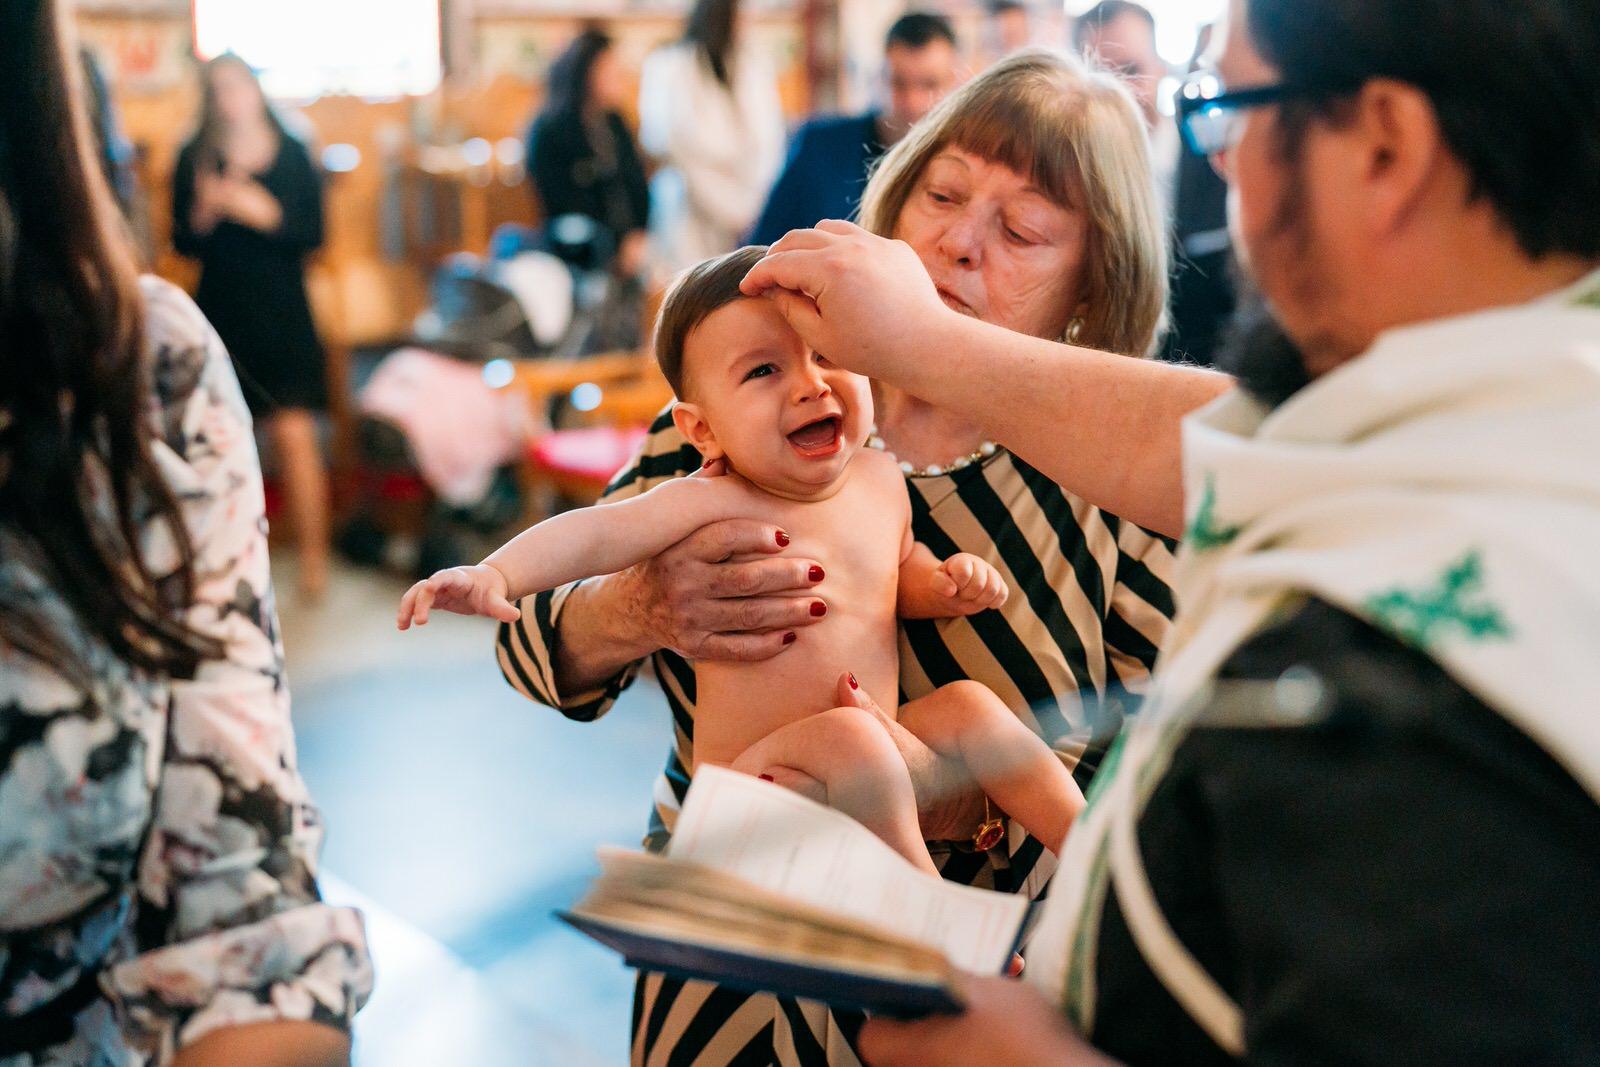 yianni-baptism-st-catherine-orthodox-mascot-laqua-104